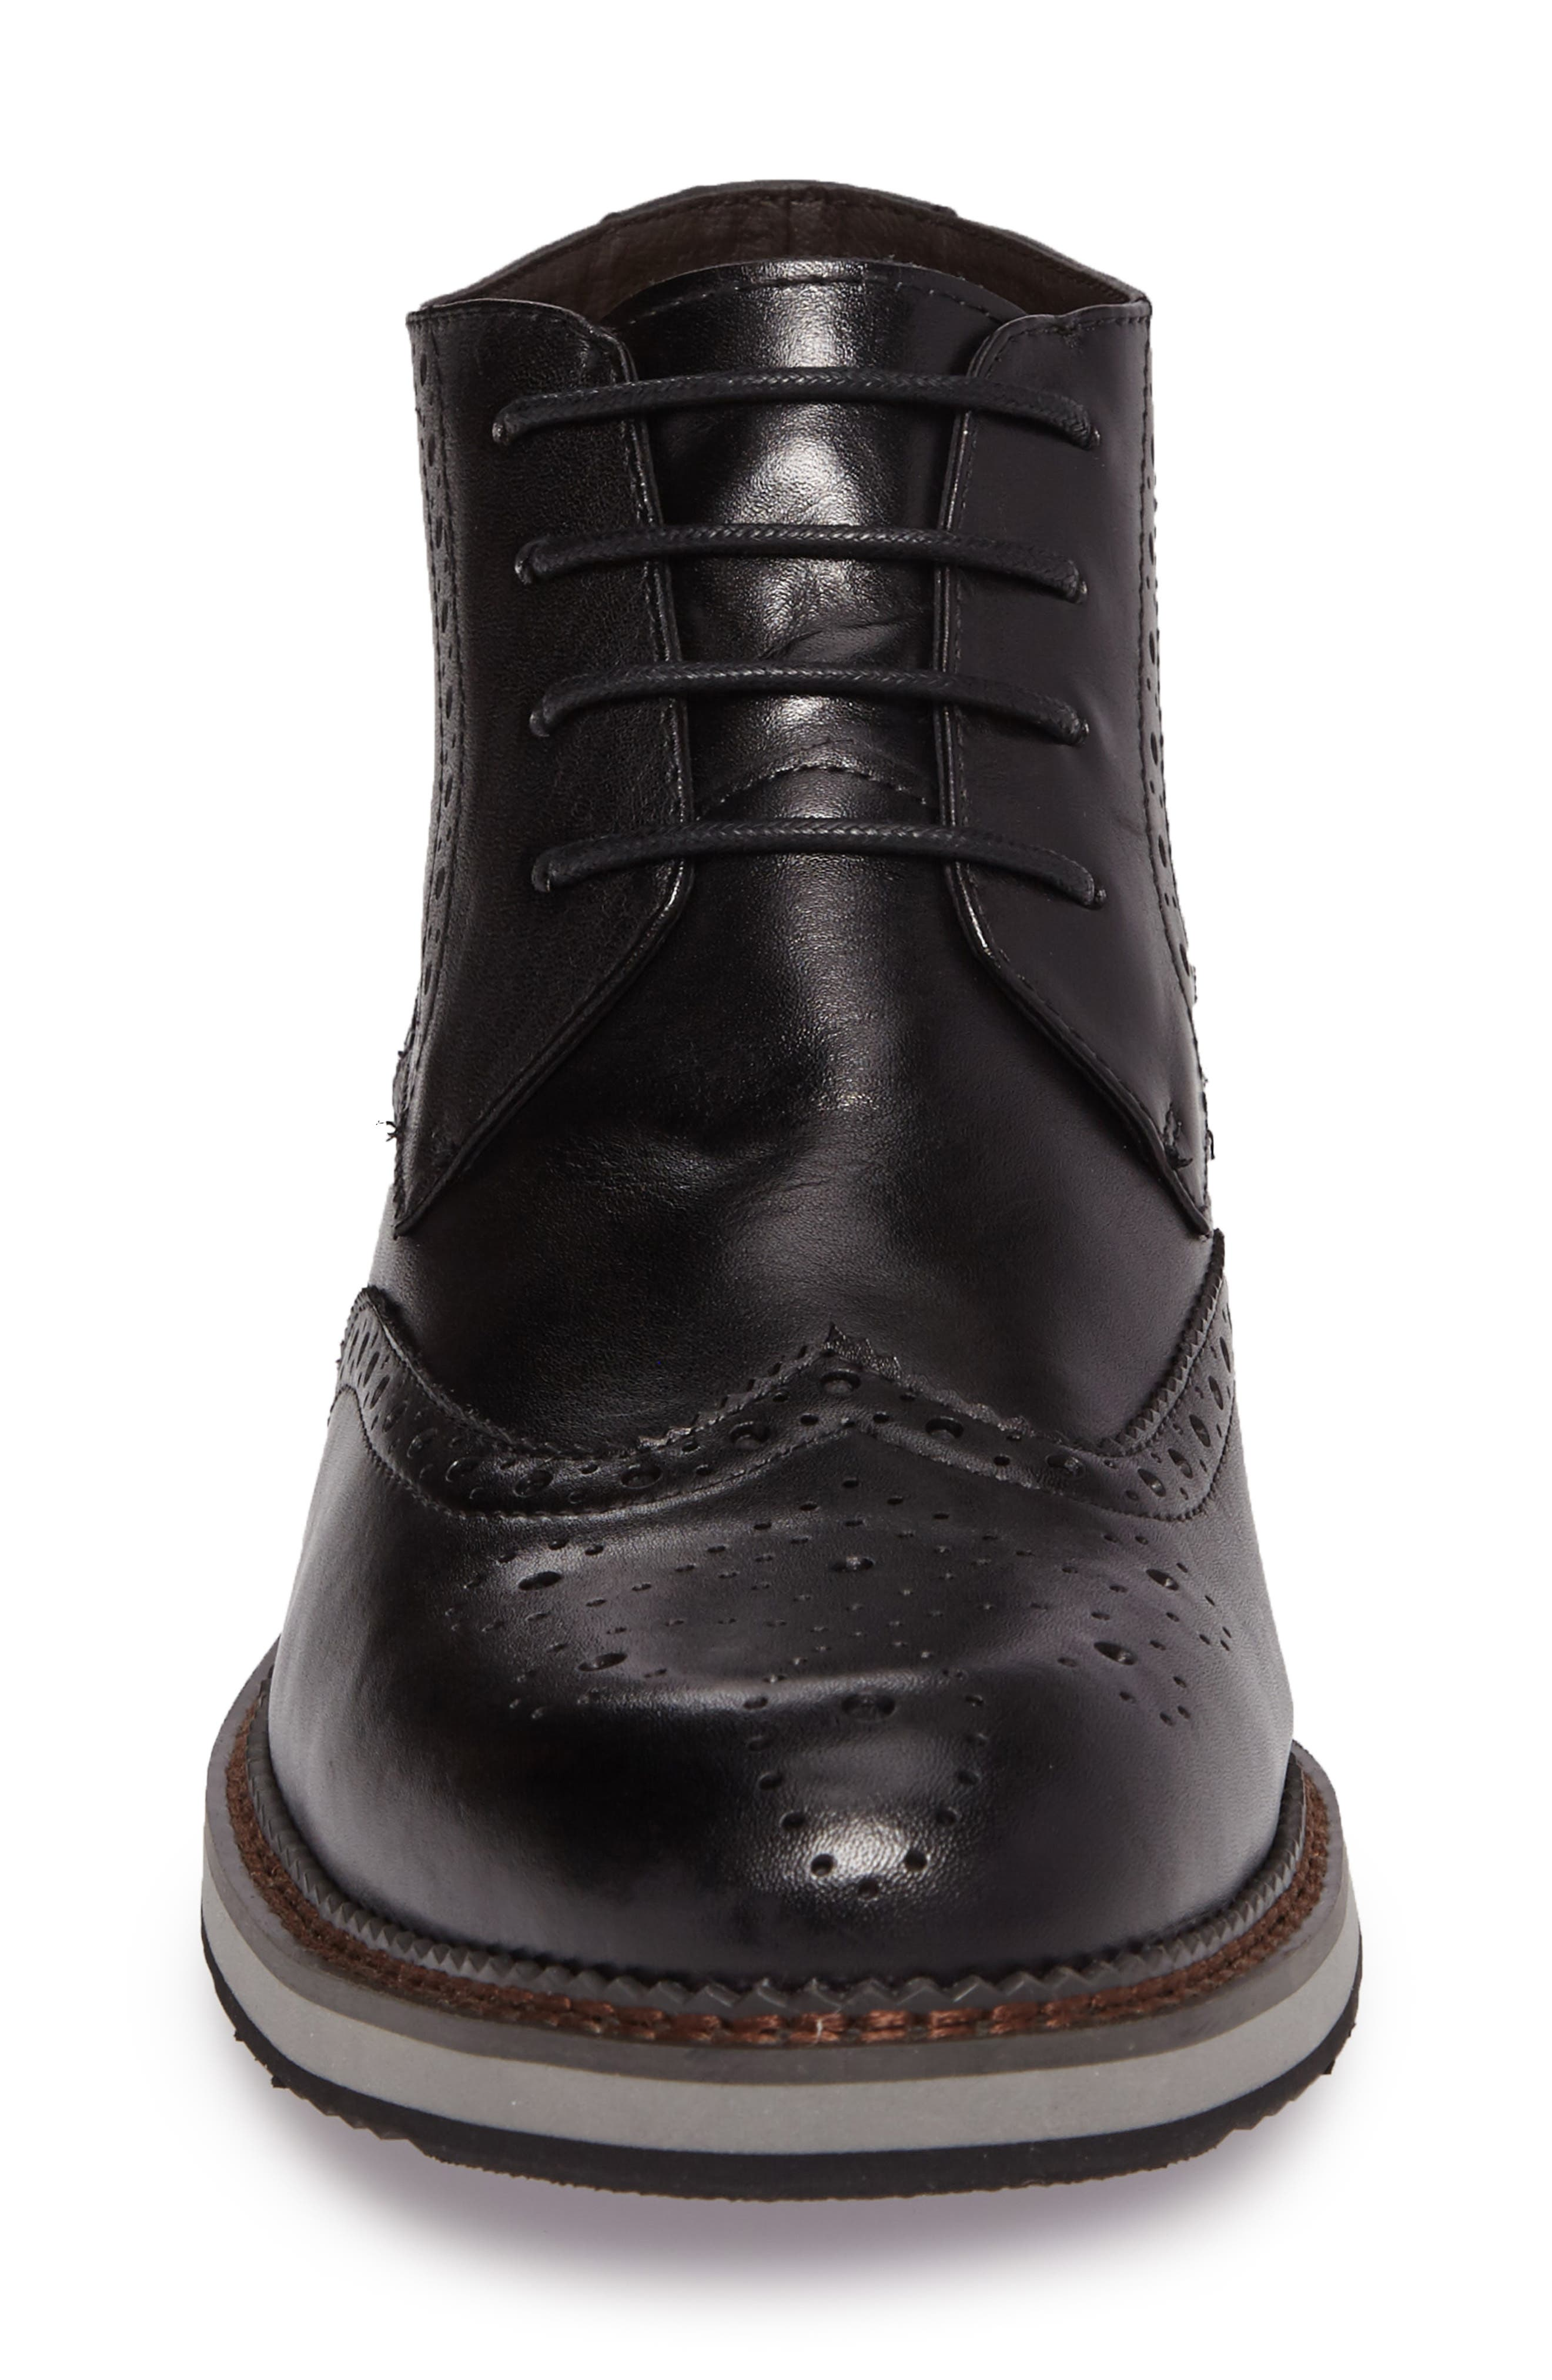 Ascot Wingtip Boot,                             Alternate thumbnail 4, color,                             Black Leather